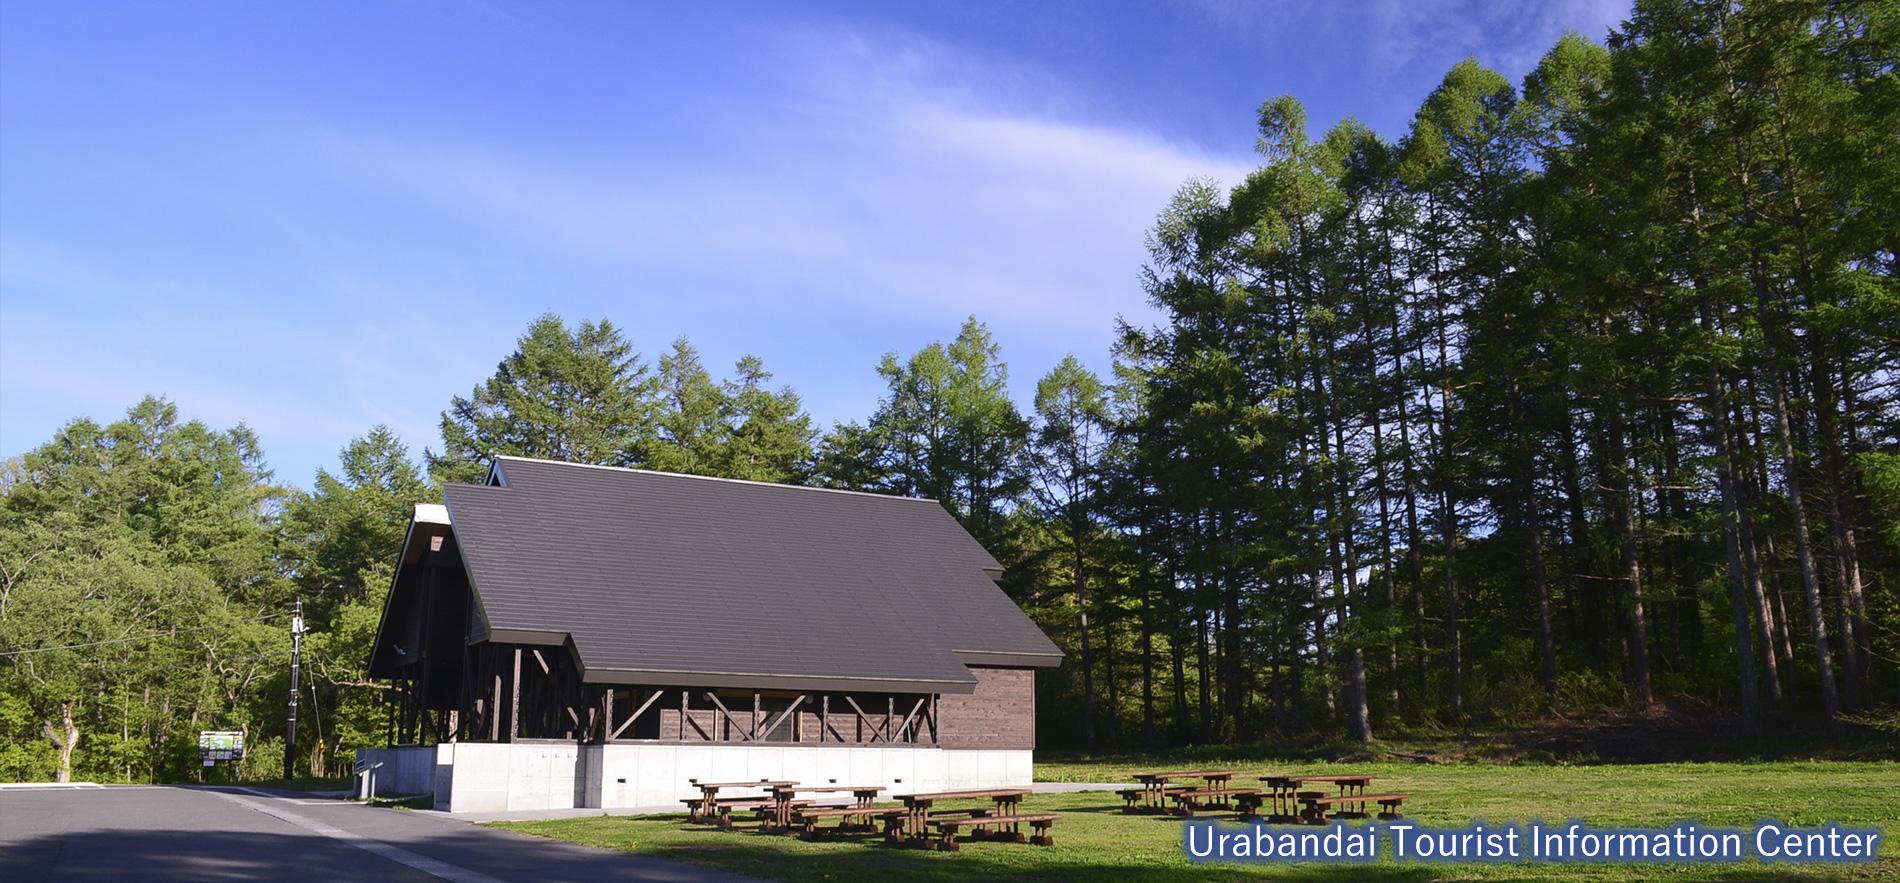 Urabandai Tourist Information Center